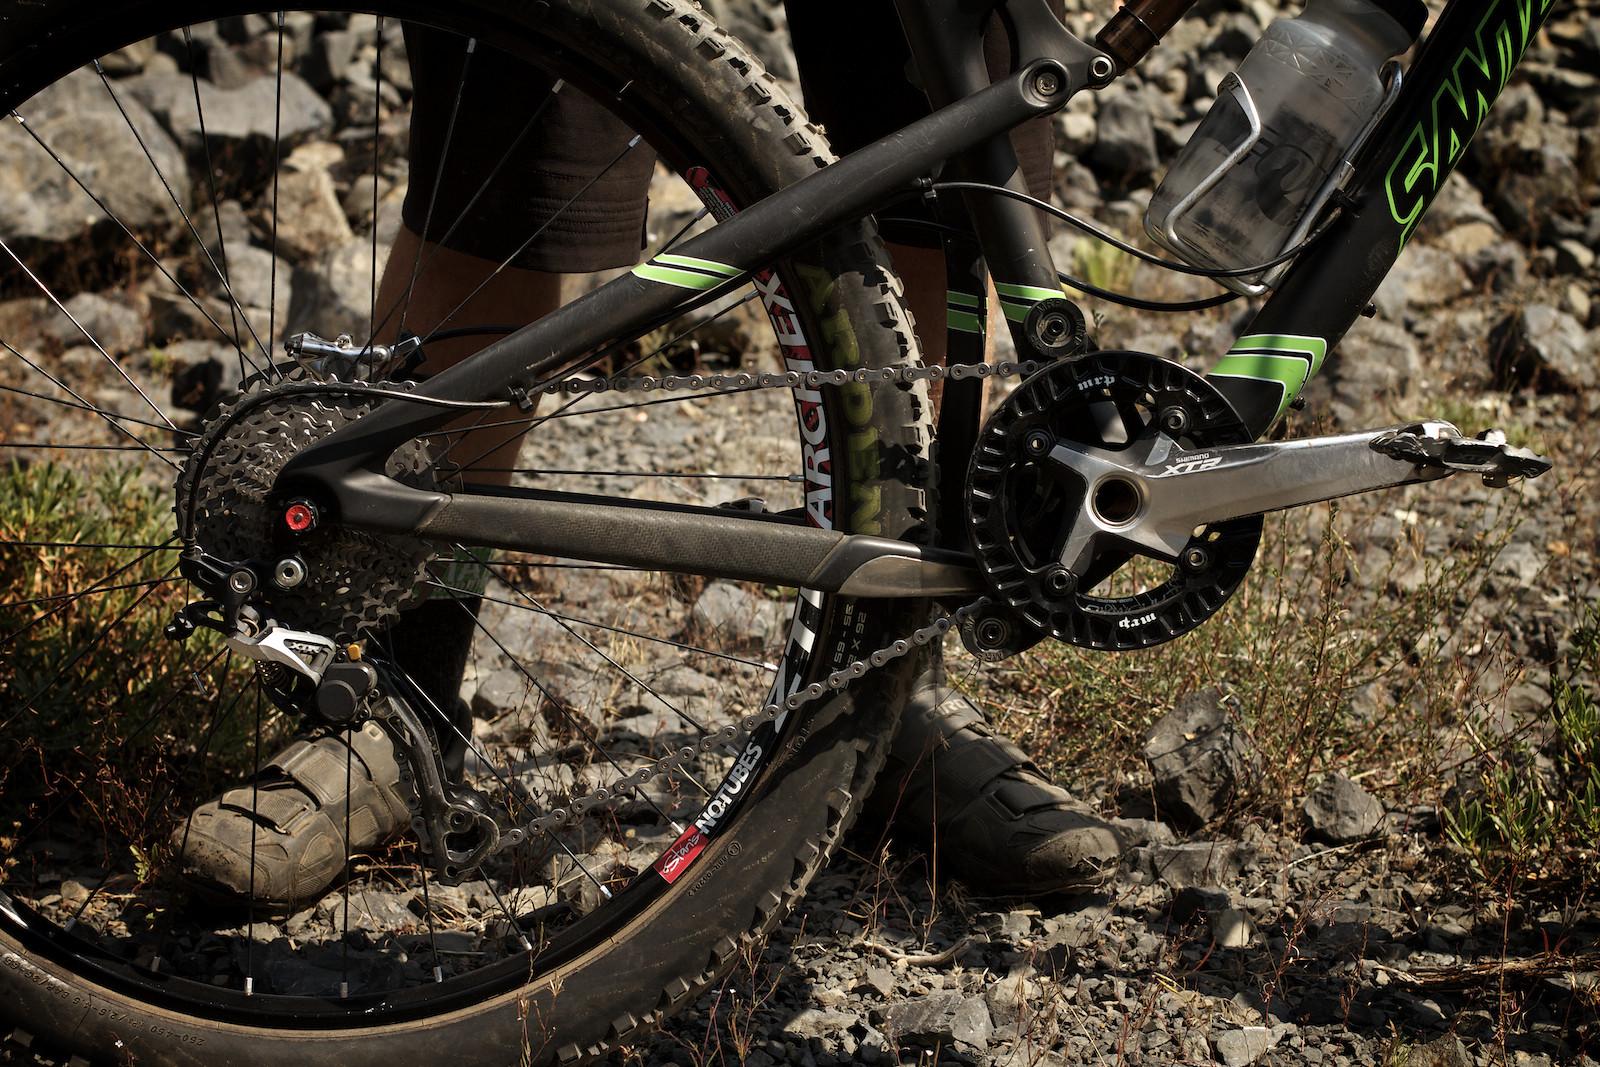 Chris Johnston's Blur TRc Drivetrain - corytepper.com - Mountain Biking Pictures - Vital MTB